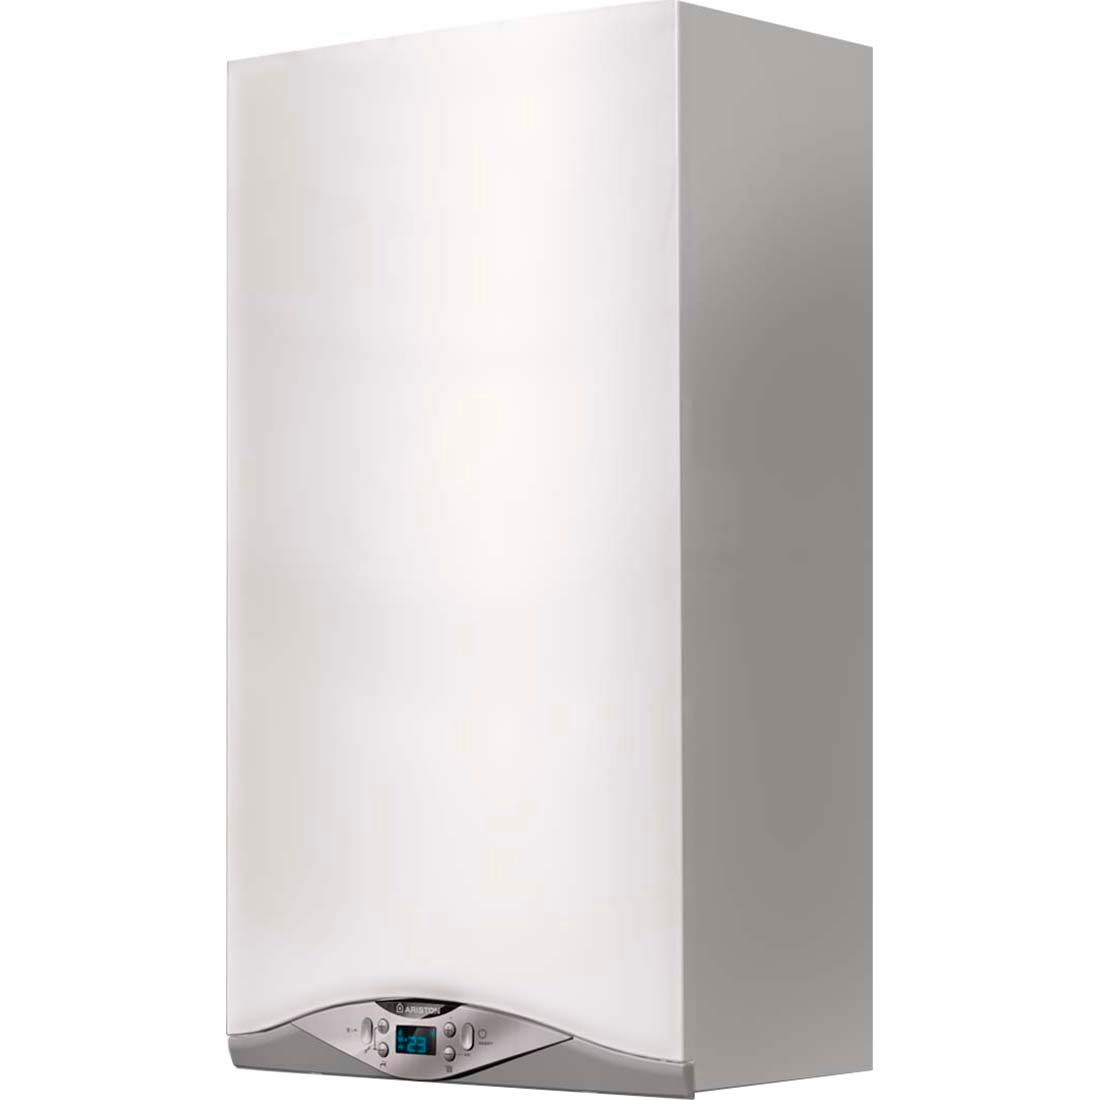 Centrala termica murala in condensare Ariston Cares Premium 24 EU, Gaz, Tiraj fortat, 24 kW, Doua schimbatoare de caldura, Display digital imagine fornello.ro